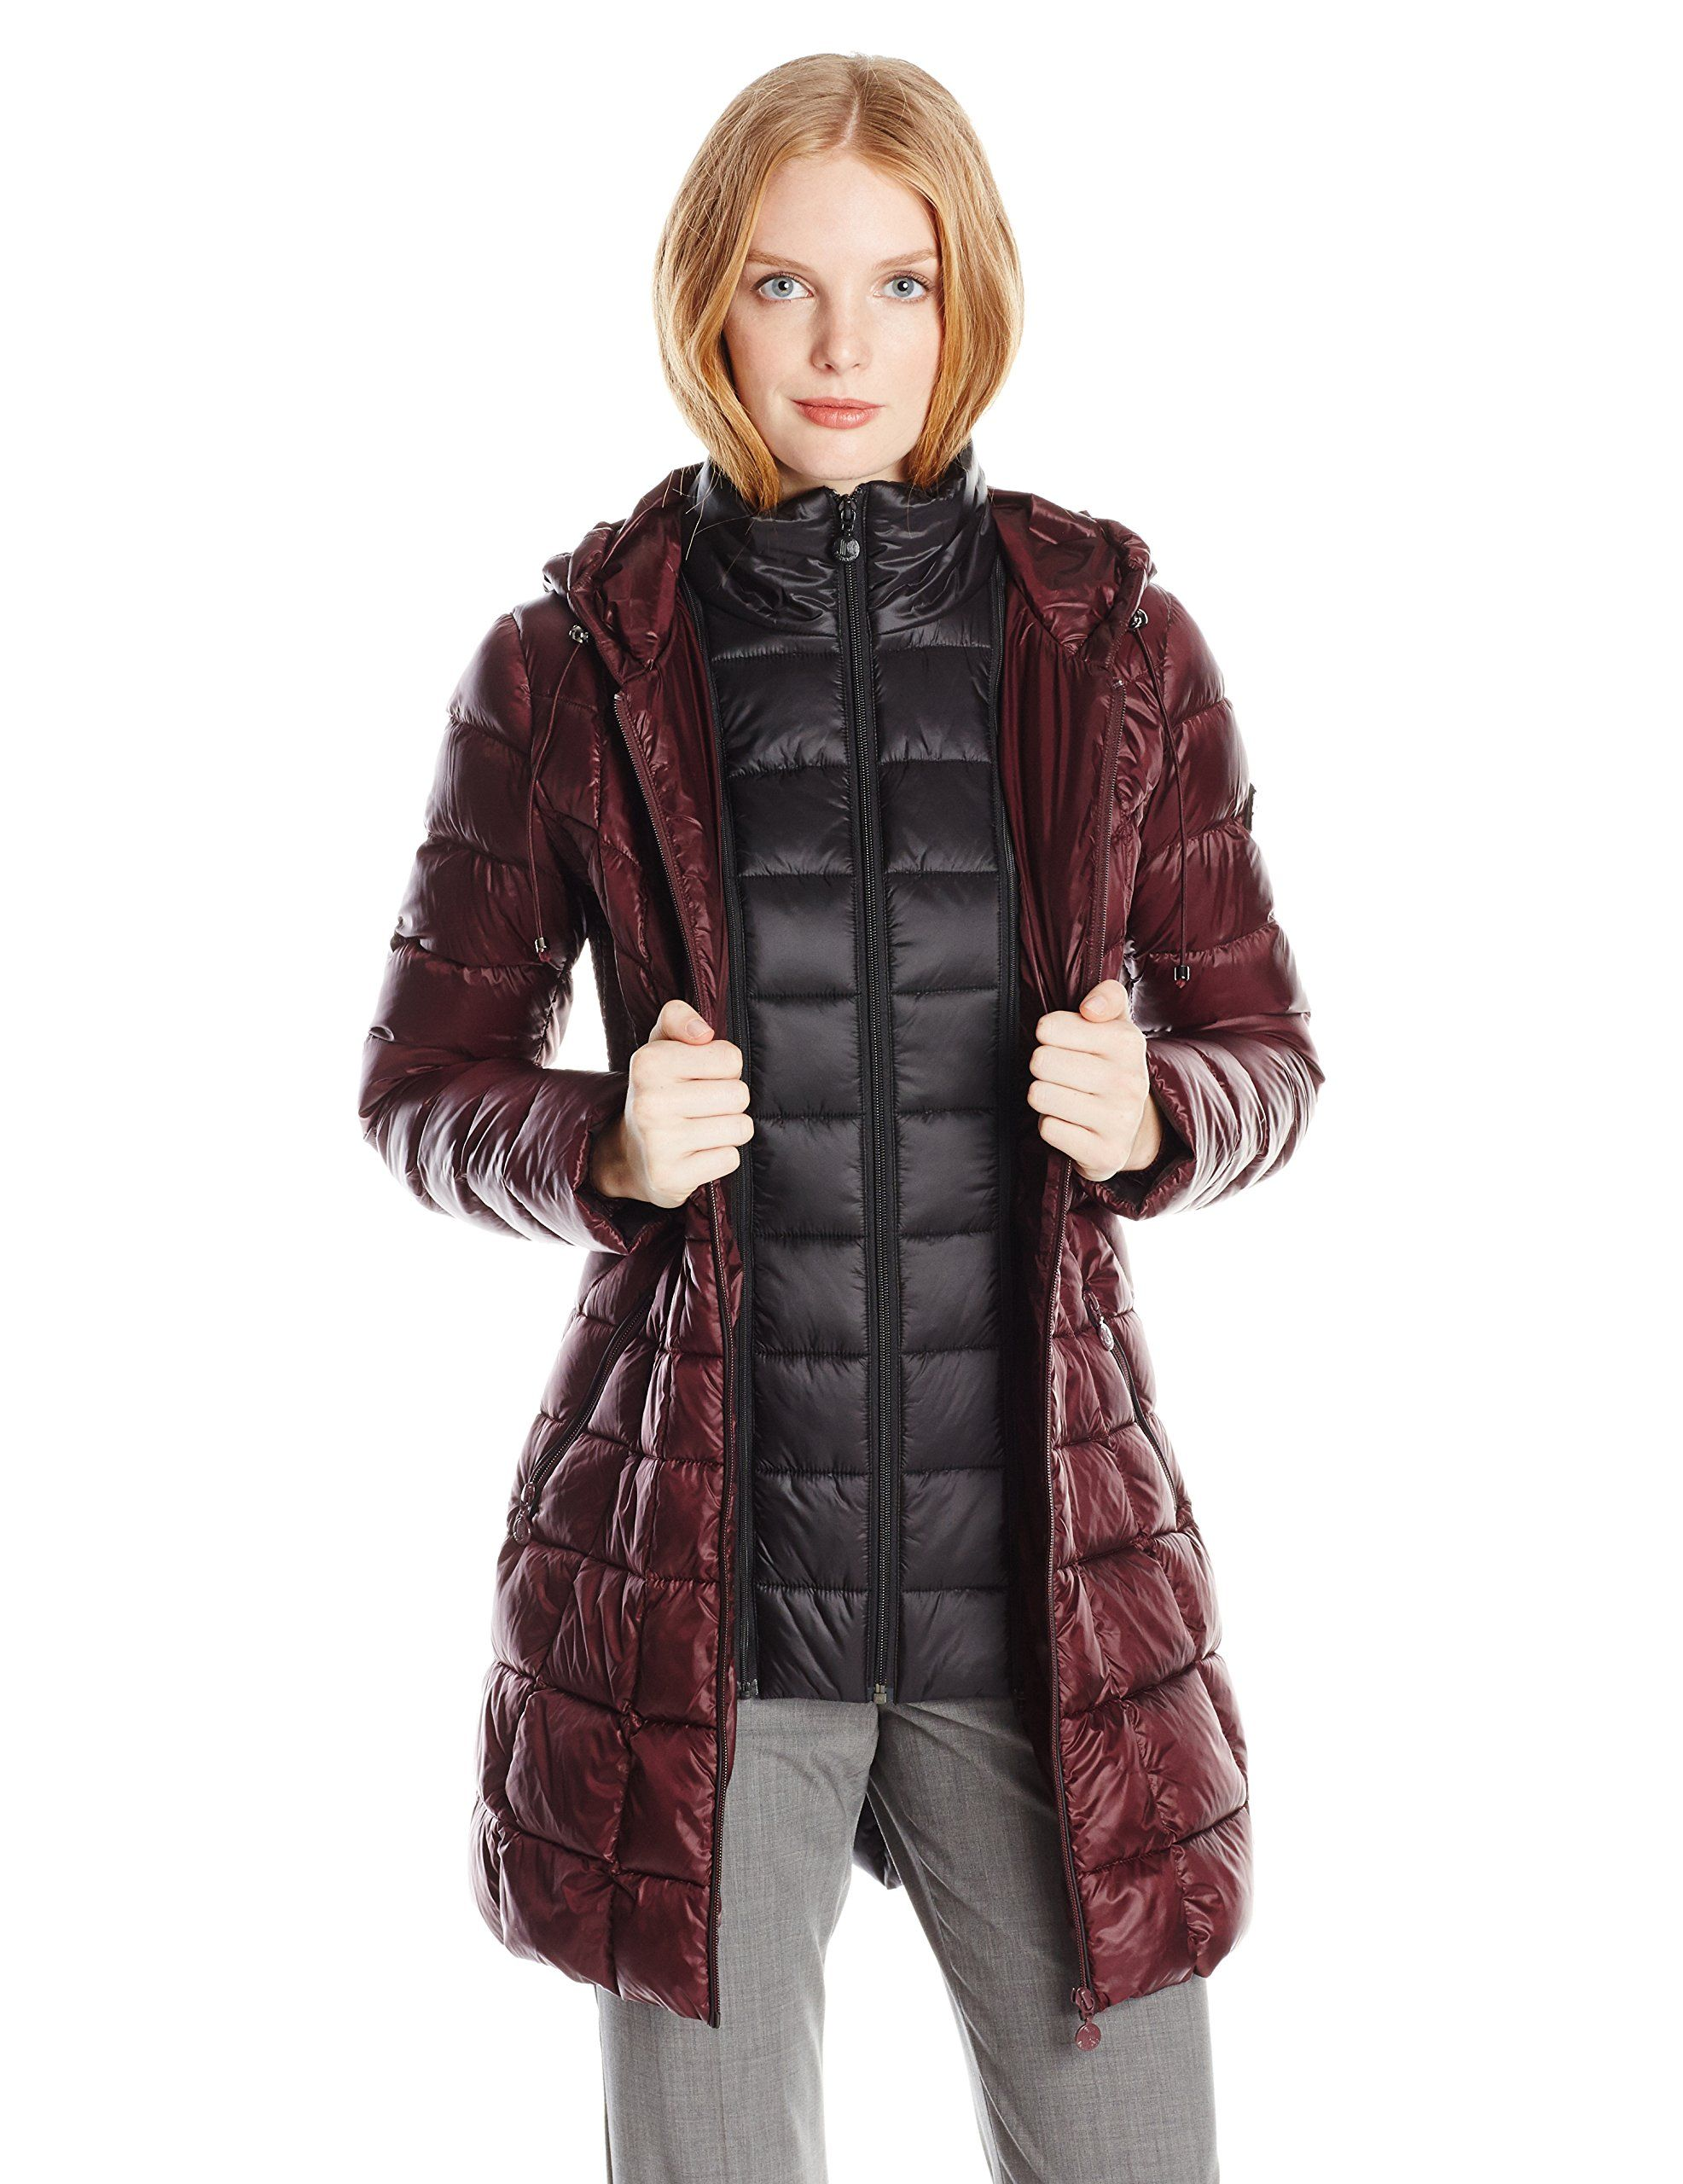 Bernardo Women S Packable Down Coat At Amazon Women S Coats Shop Puffer Jacket Women Coats For Women Quilted Outerwear [ 2560 x 1973 Pixel ]